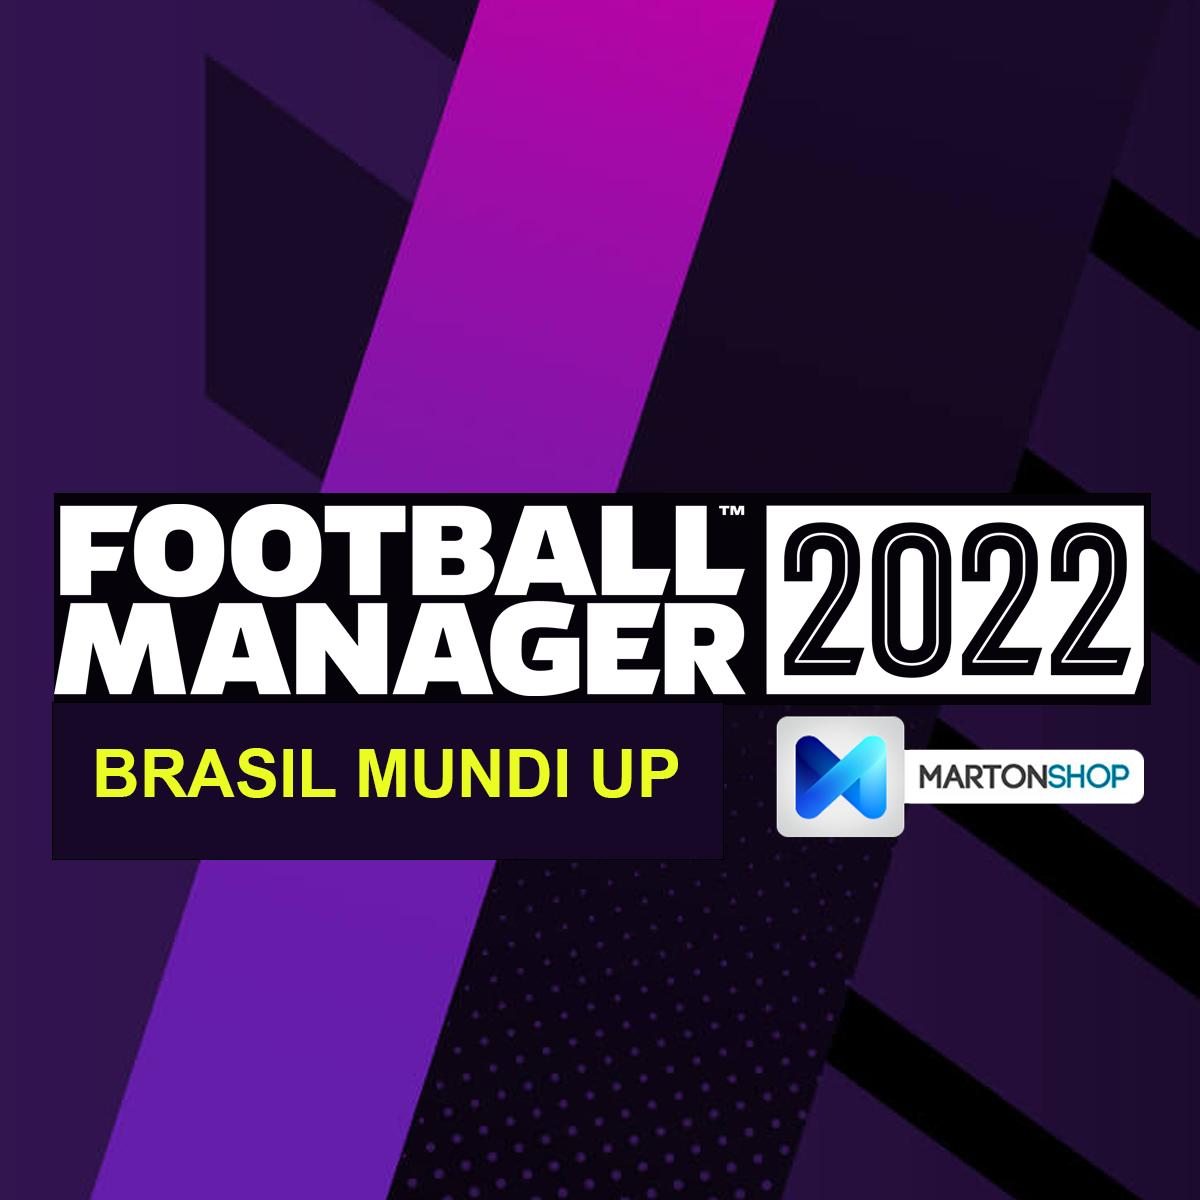 PRÉ-VENDA: Football Manager 2022 Original Steam + Brasil Mundi Up